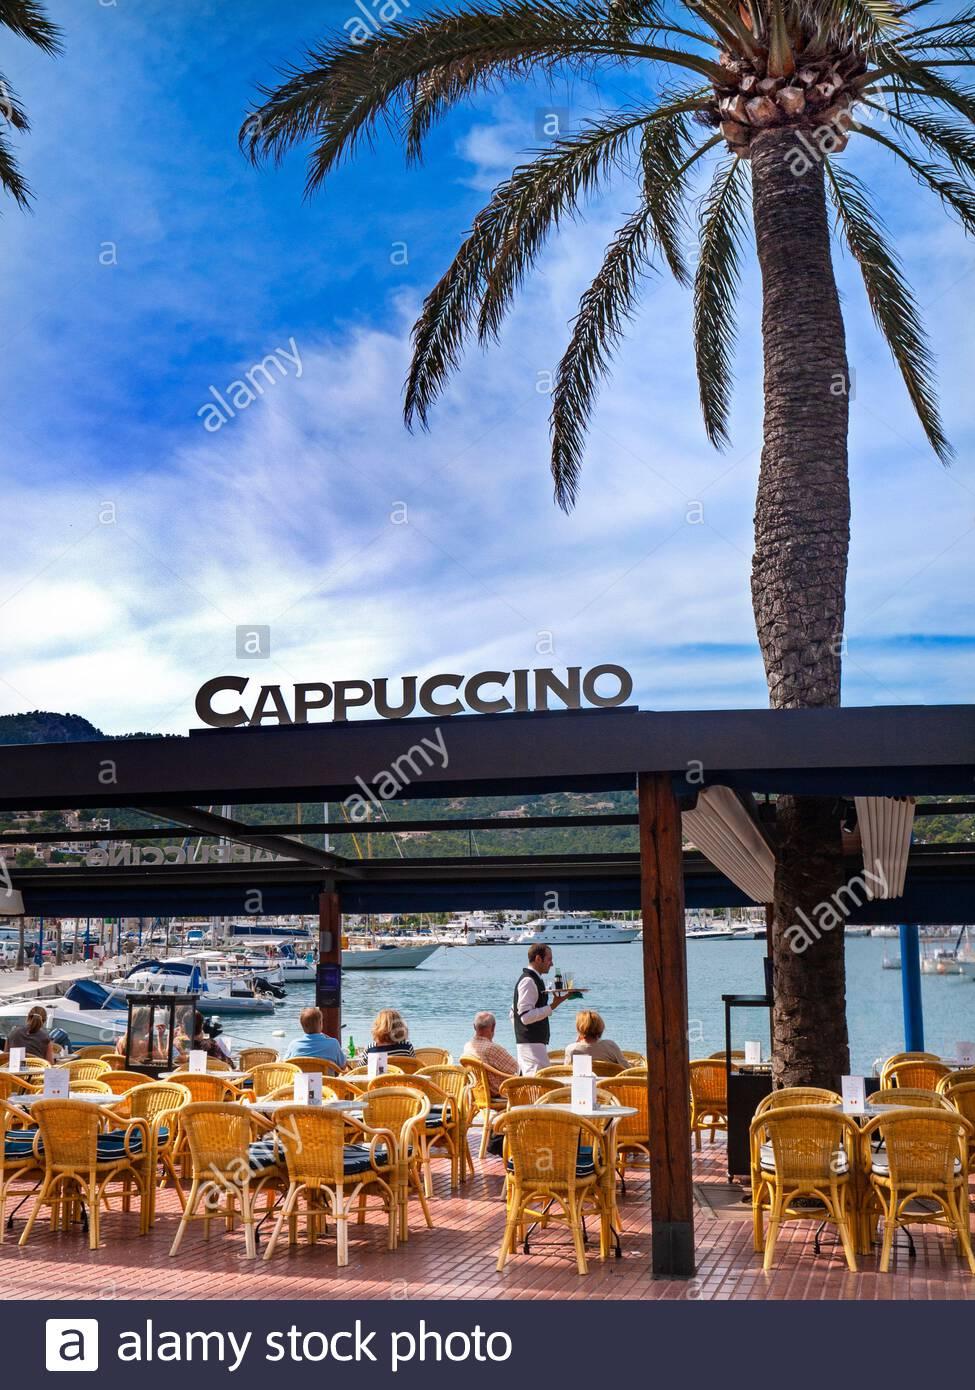 ANDRATX WAITER SERVICE MALLORCA SEAFRONT ALFRESCO BAR CAFE CAPPUCINO PALM TREE  Coastal alfresco luxury waterside Cappuccino Restaurant cafe and bar in Puerto Andratx Mallorca Balearic Islands Spain Stock Photo